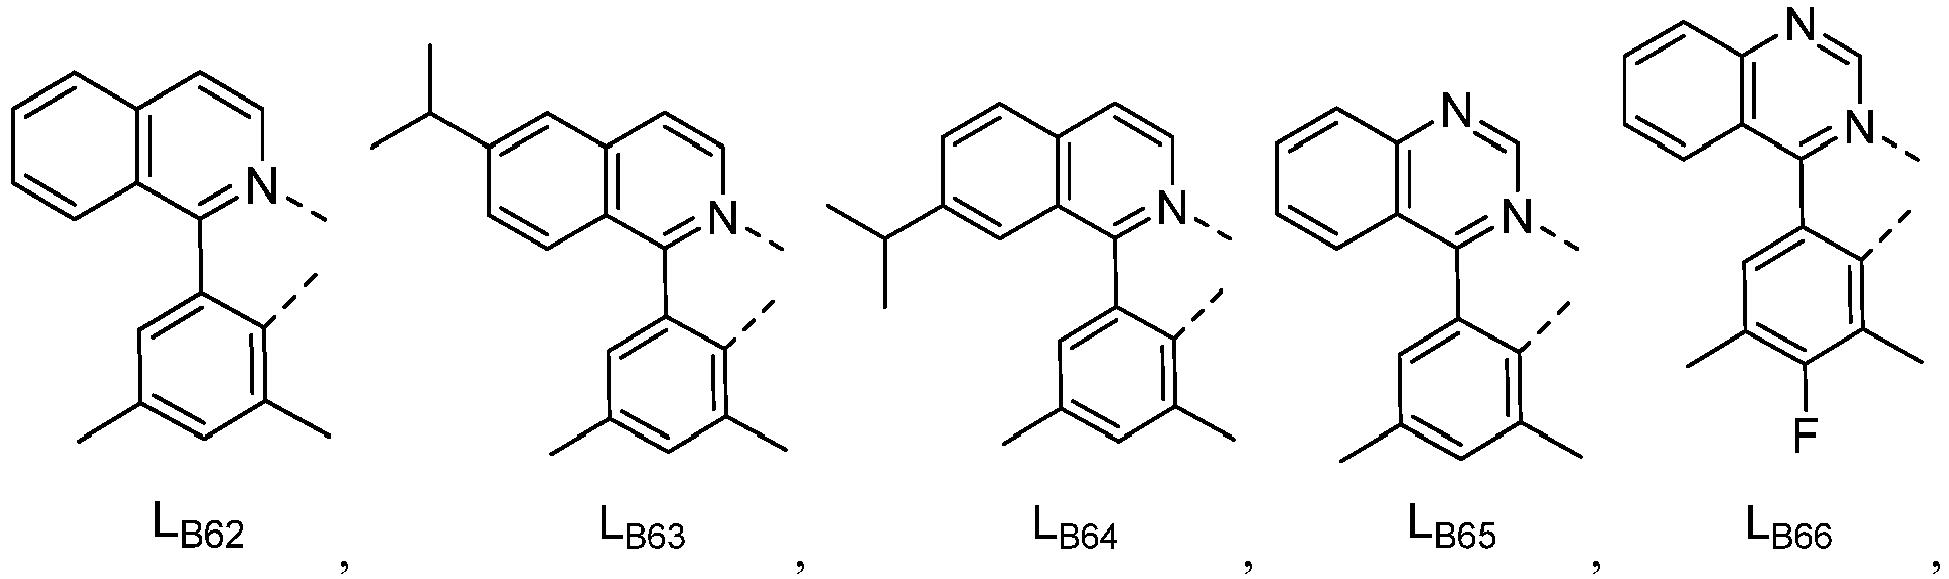 Figure imgb0820